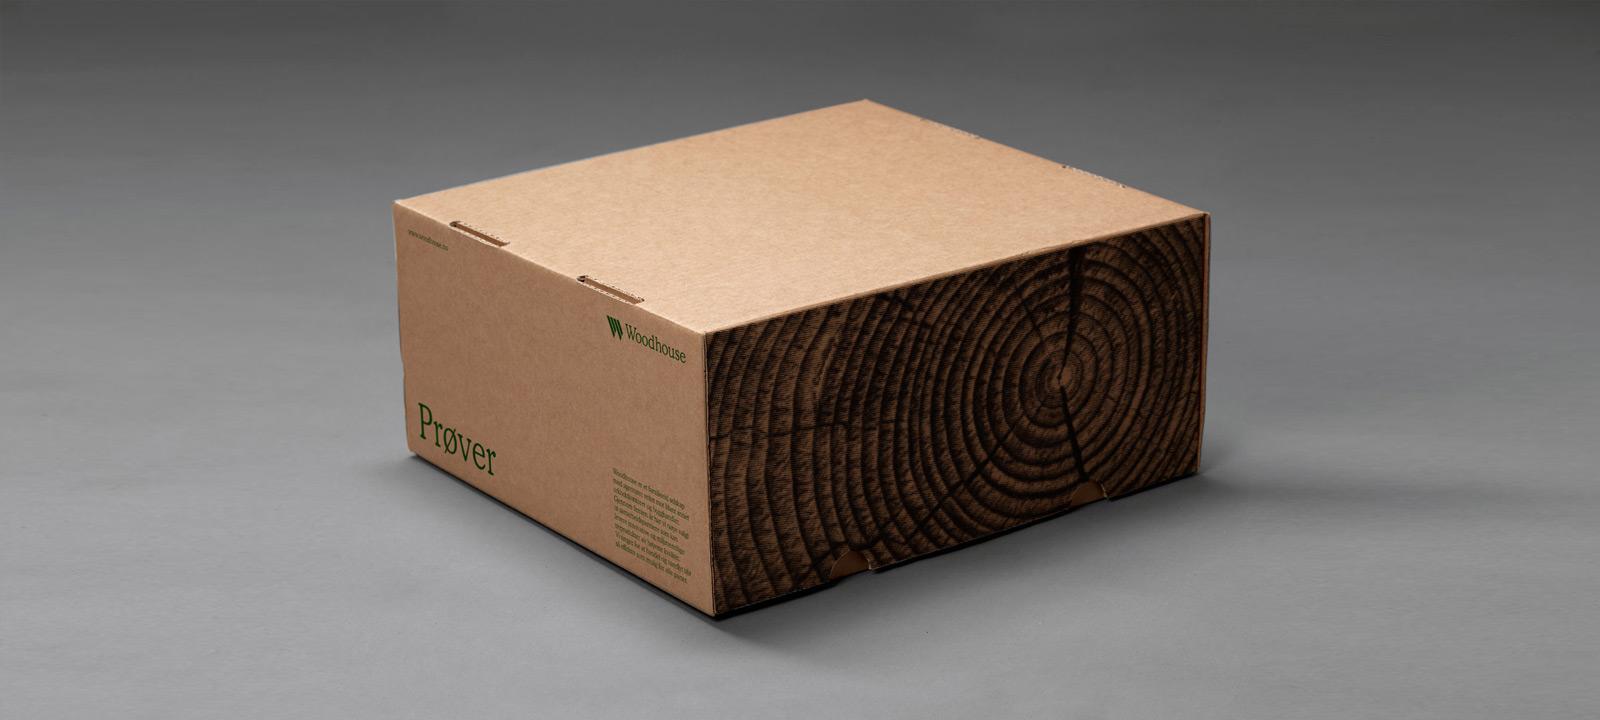 Prover Wood Design